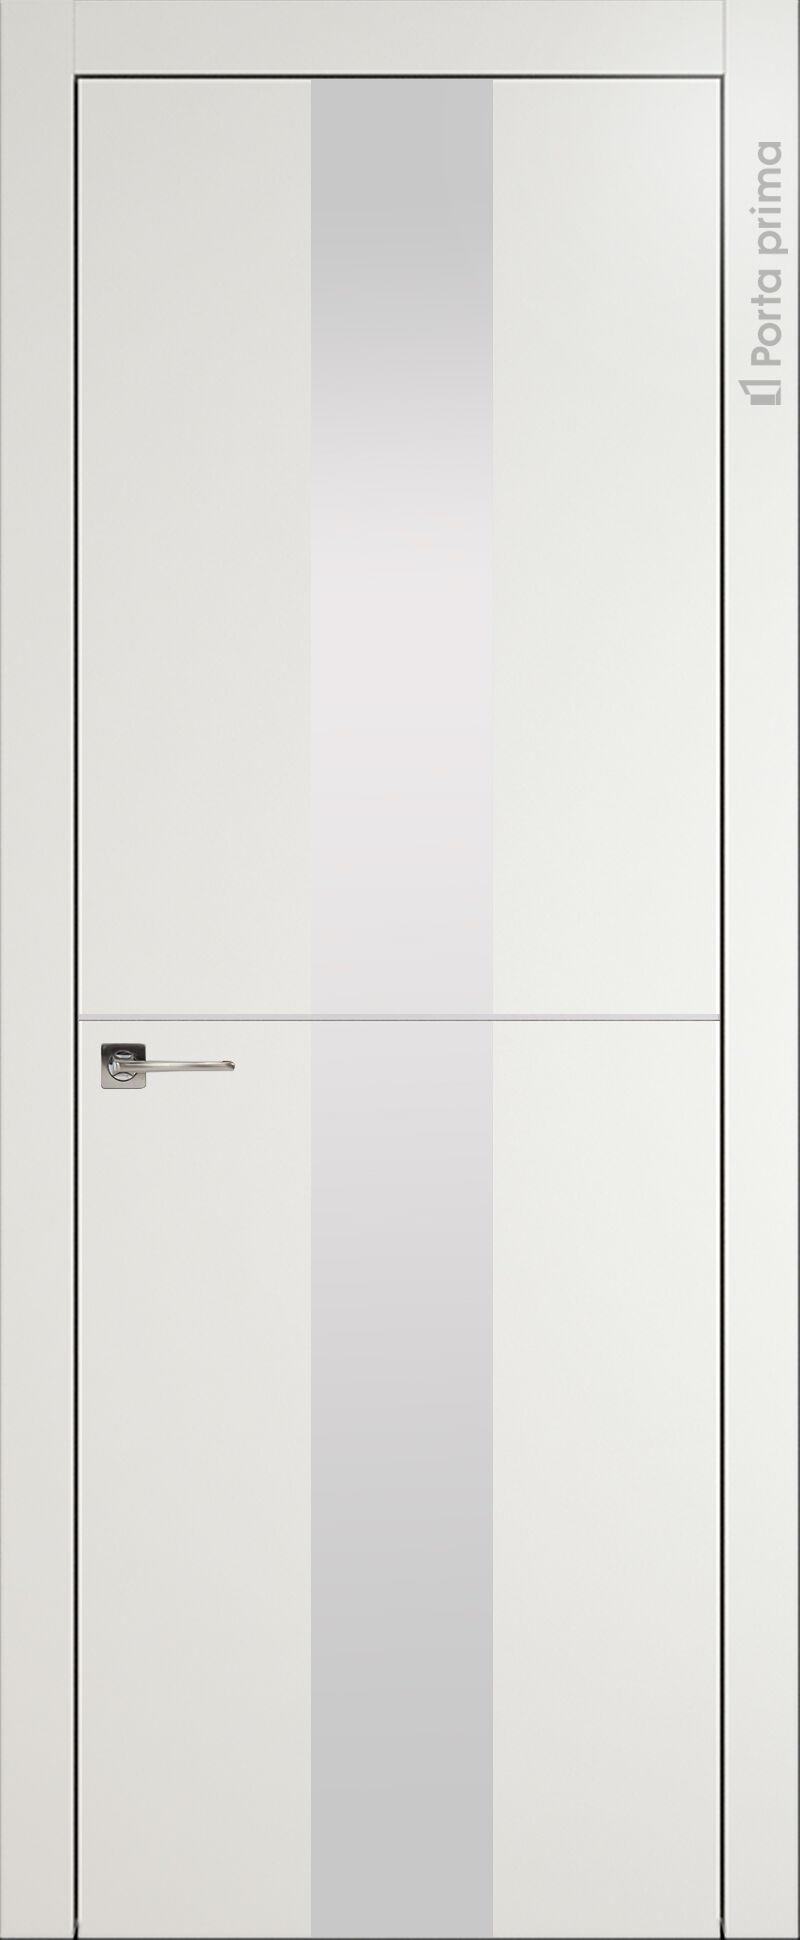 Tivoli Ж-3 цвет - Бежевая эмаль (RAL 9010) Со стеклом (ДО)